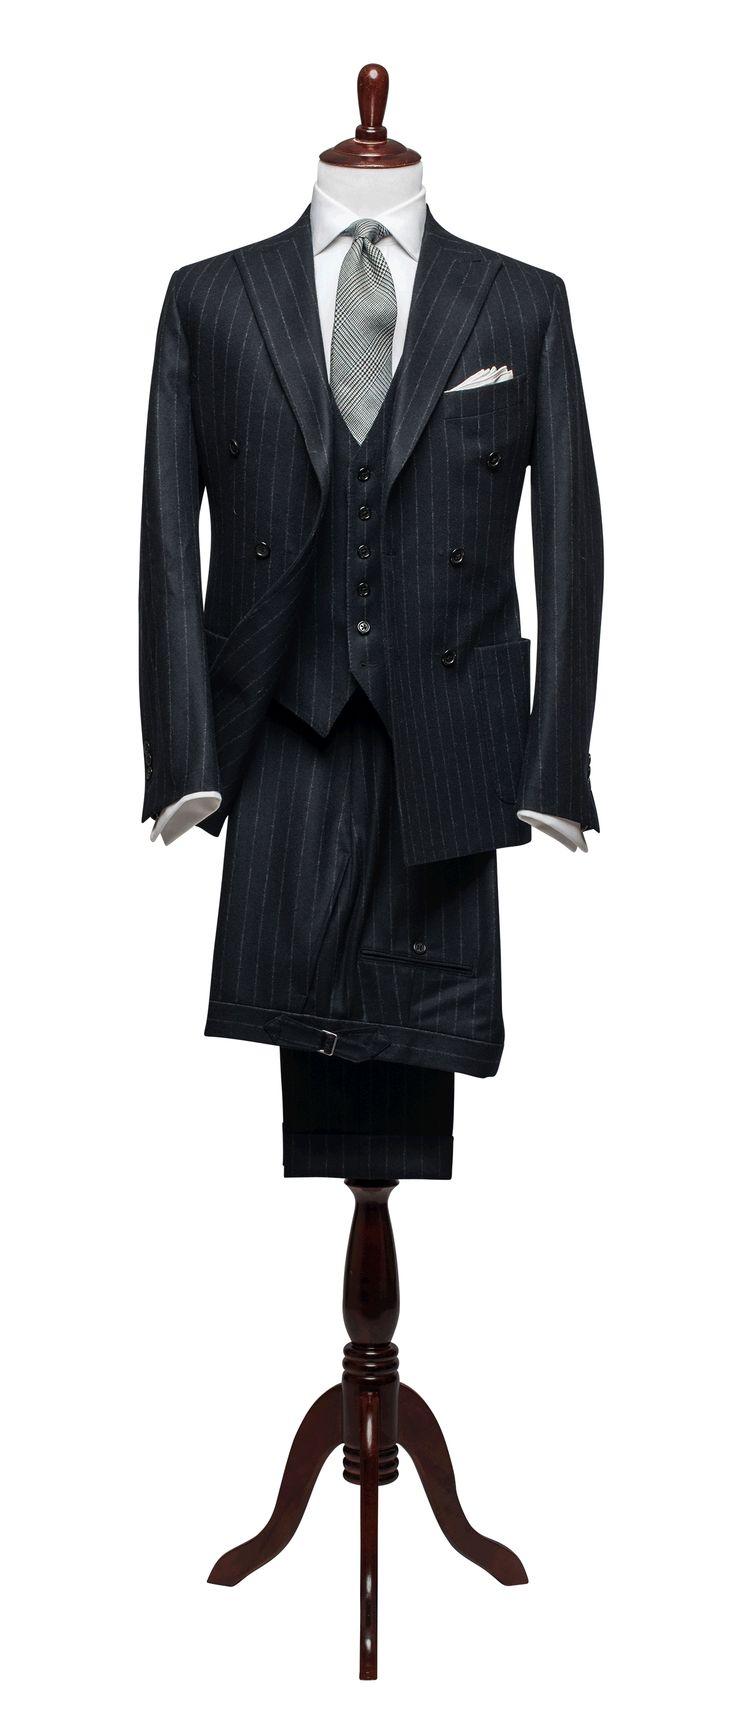 Articles of Style: Twenties Chalkstripe